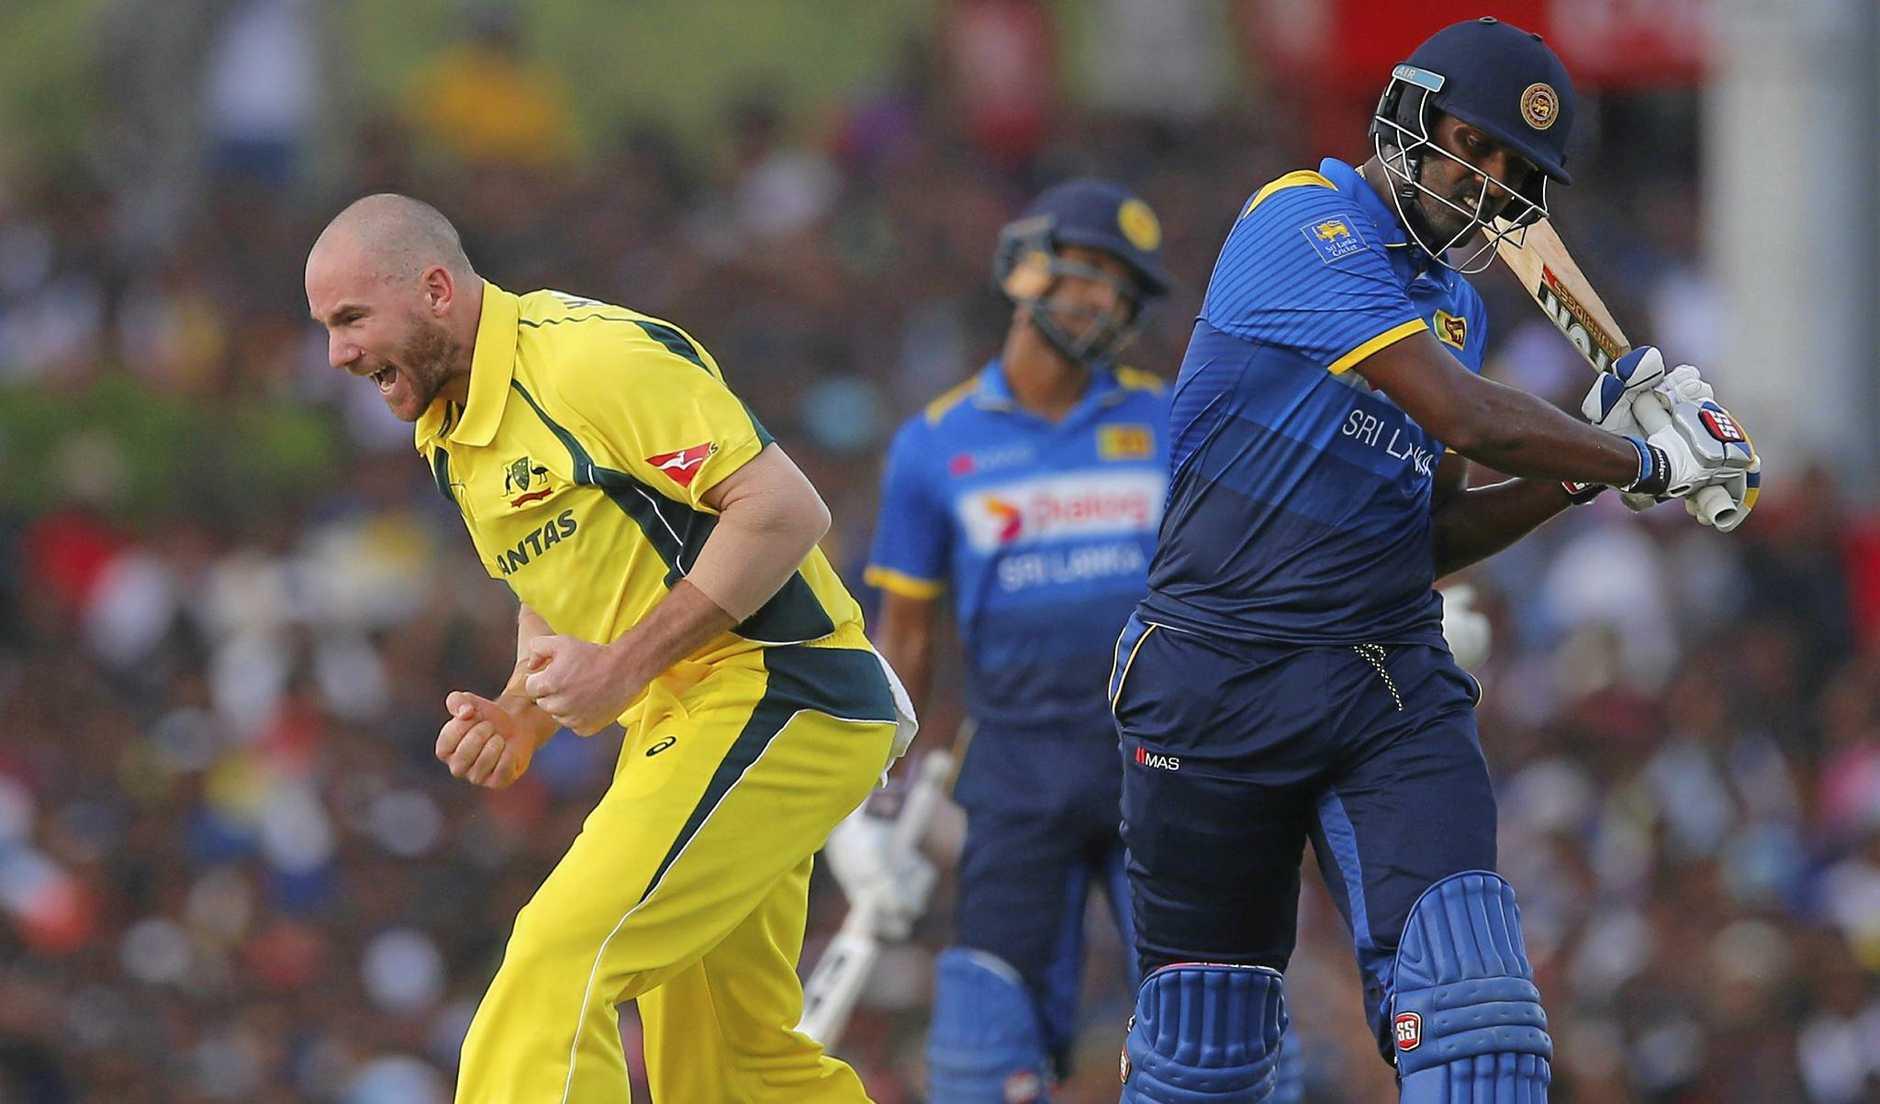 John Hastings has been in good form for Australia in the last two ODIs in Sri Lanka.